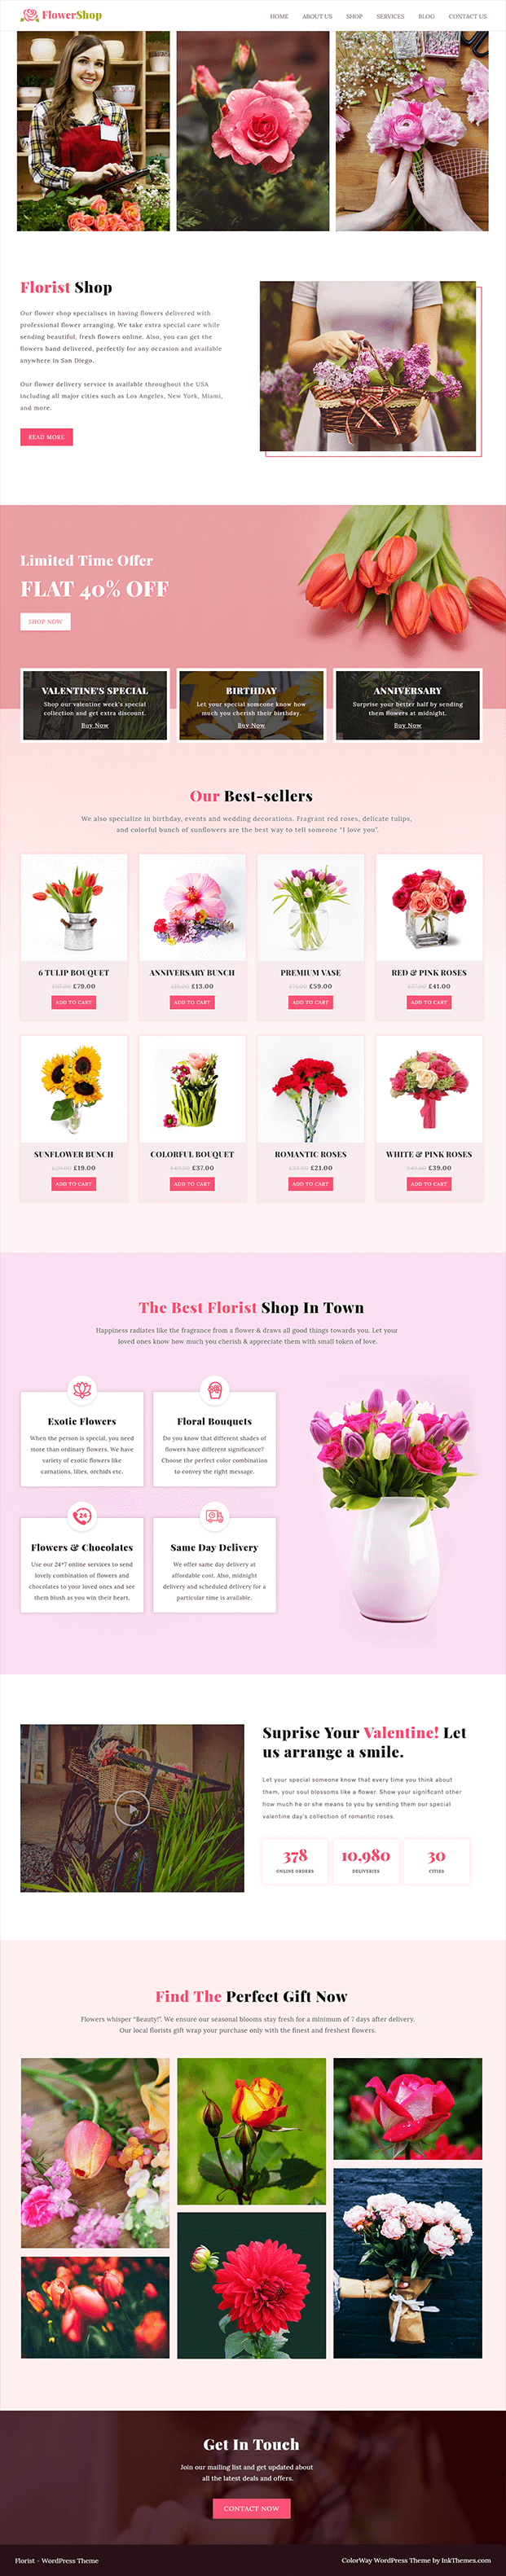 Flower Shop Florist WordPress Theme - Home